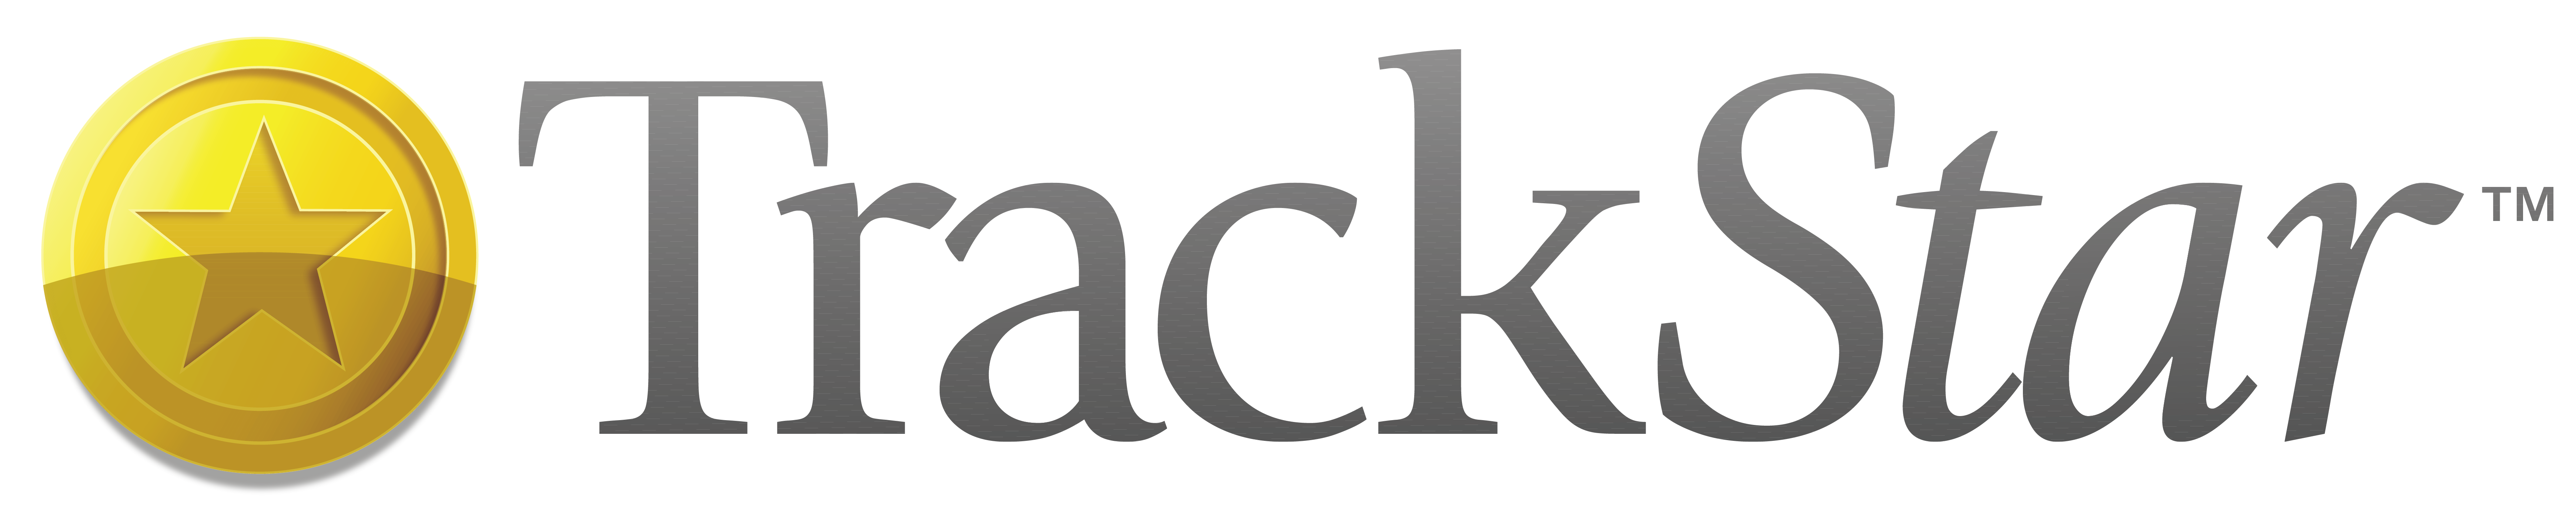 Trackstar Logo_CMYK